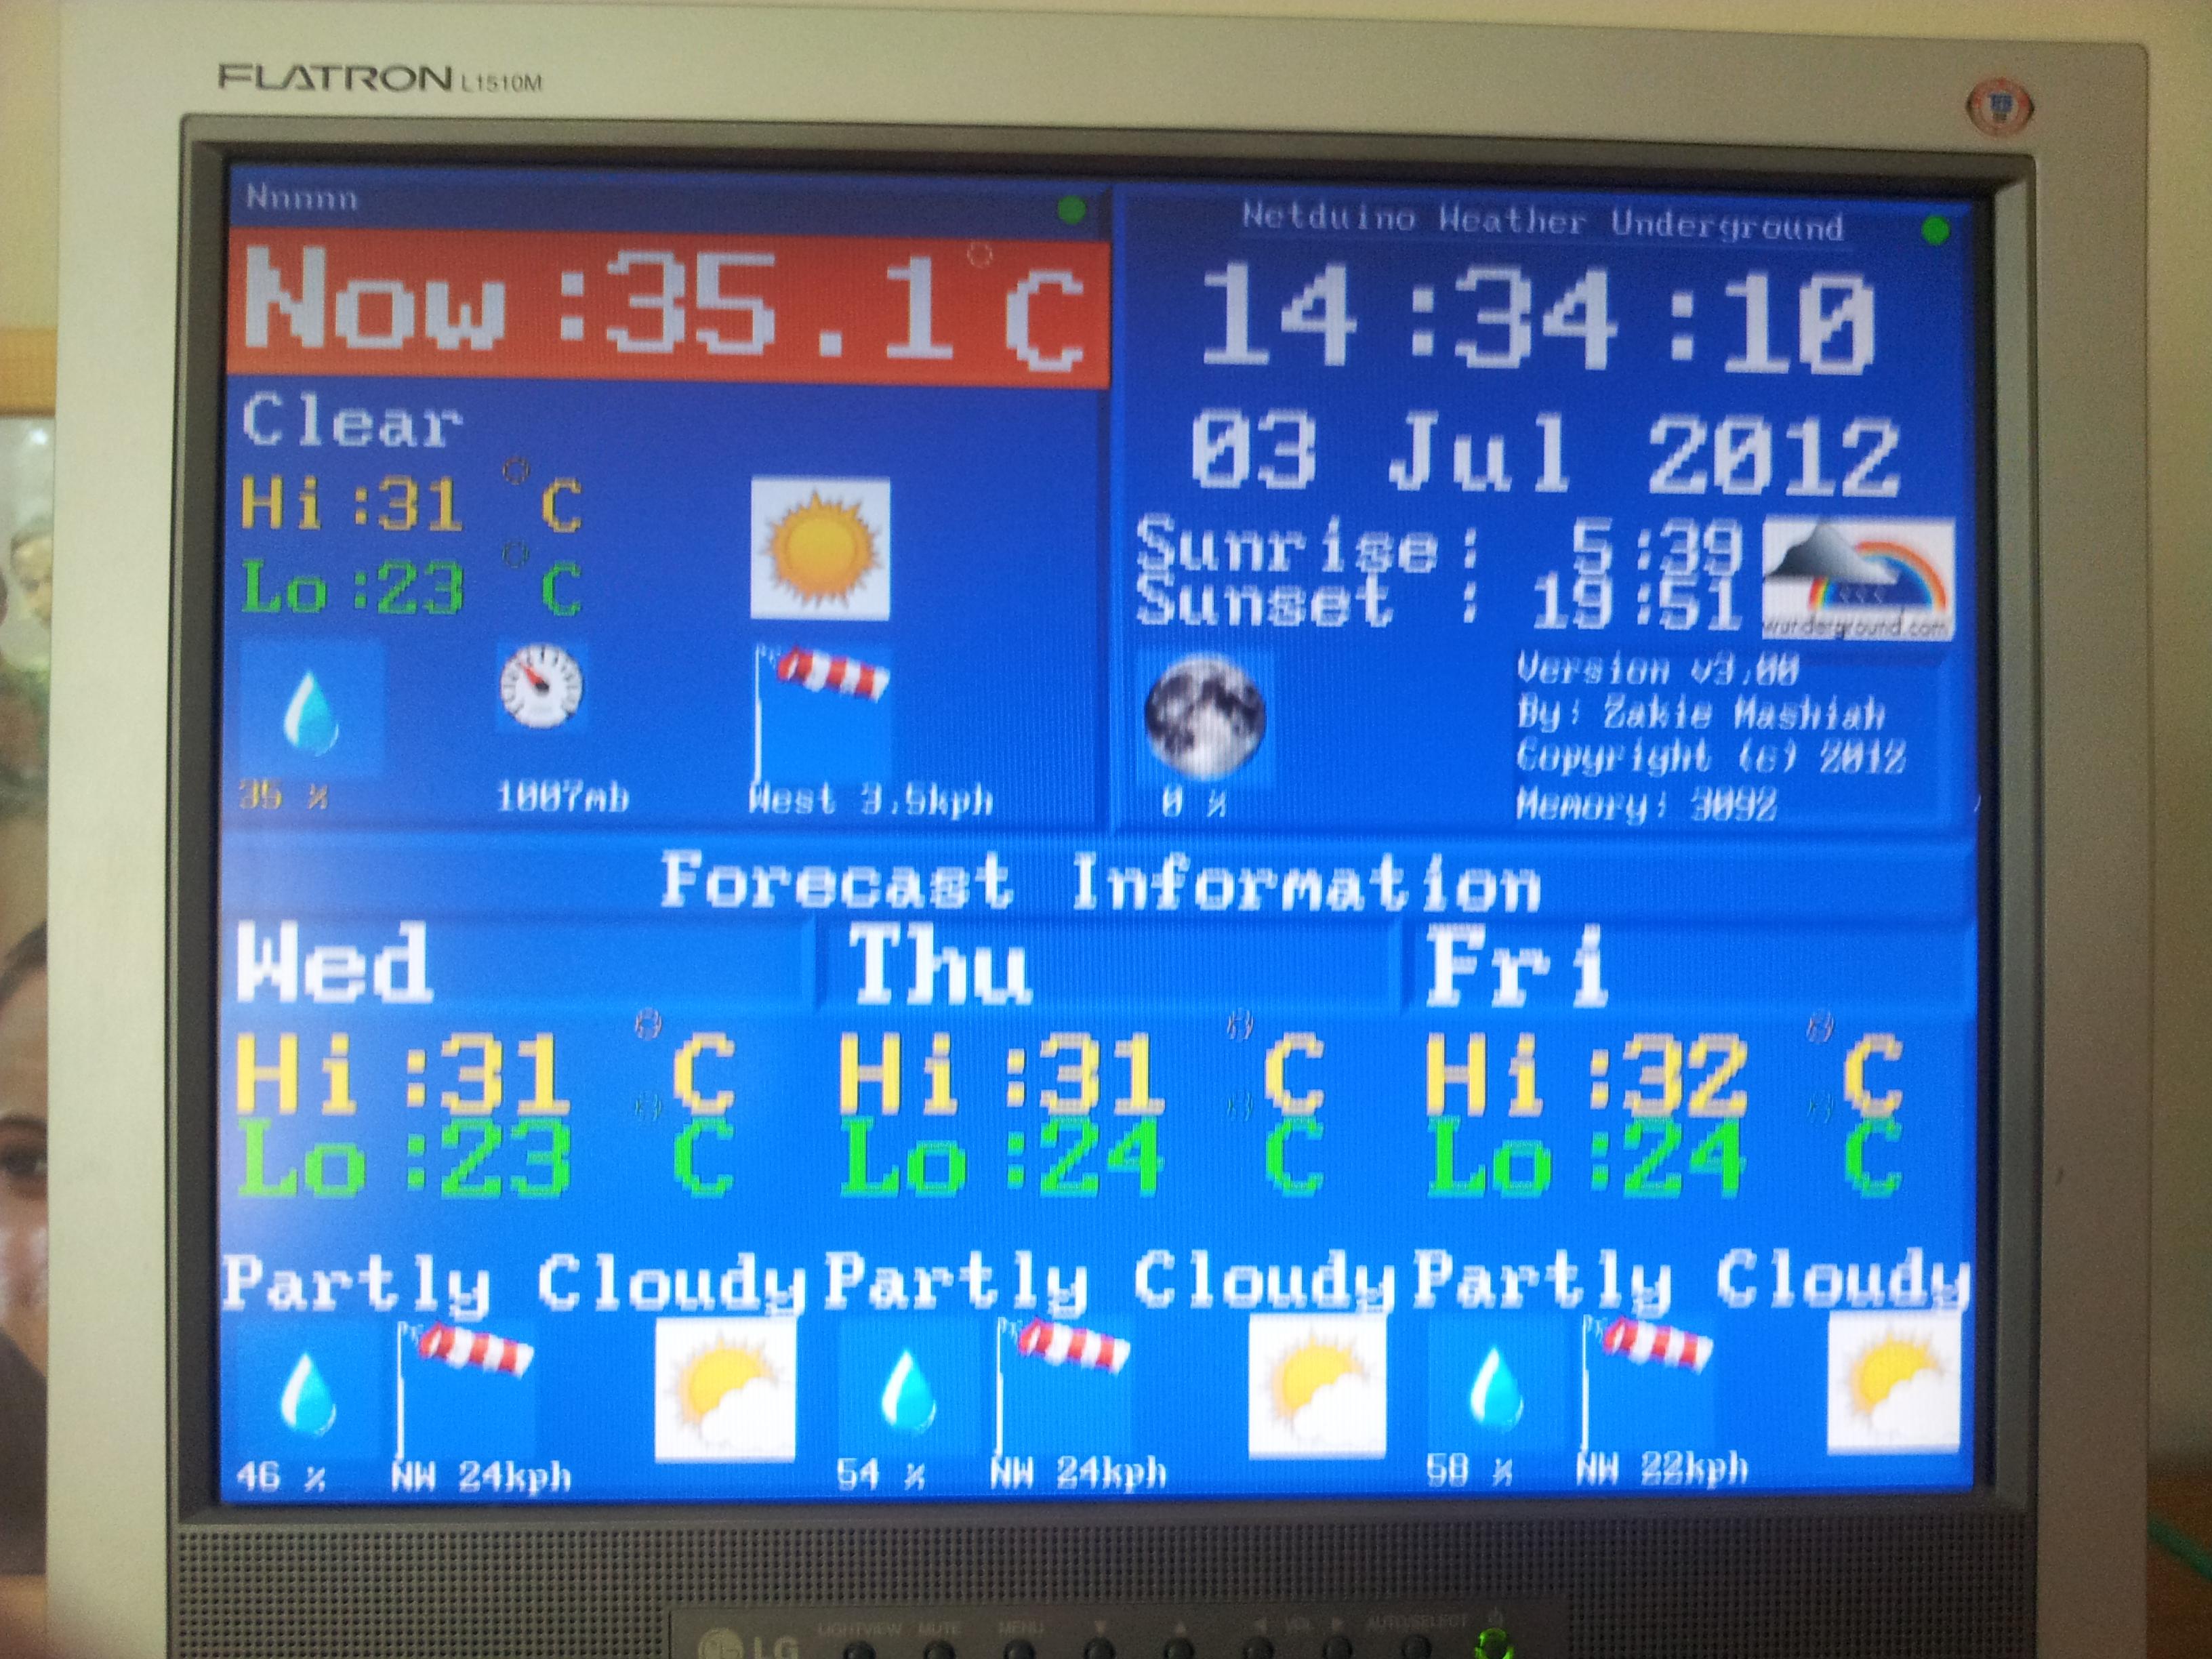 Weather station (Underground) with Netduino